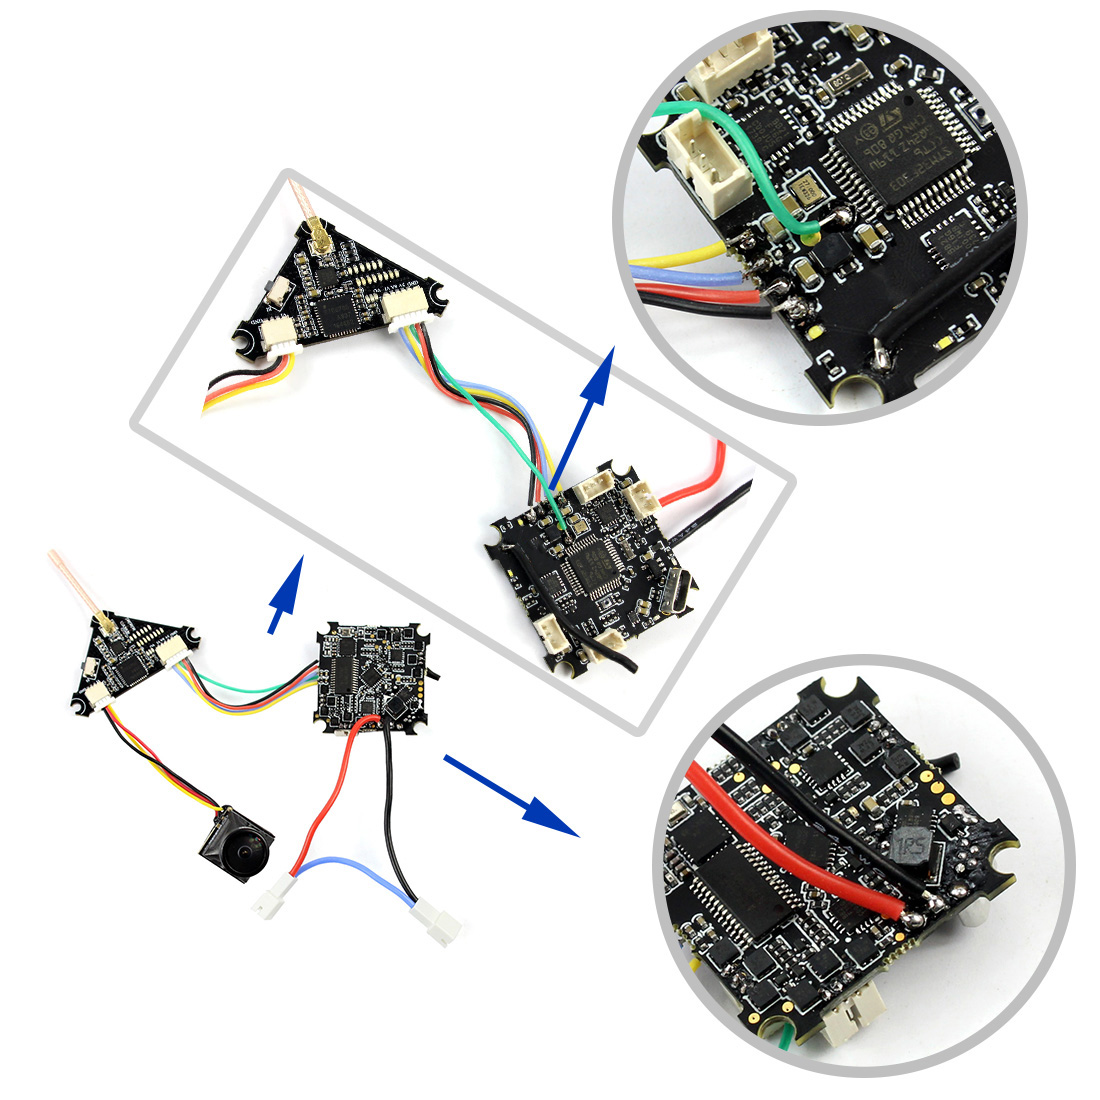 75mm V2 Crazybee F4 Pro OSD 2S FPV RC Racing Drone Caddx EOS2 1200TVL Mini Camera 25/200mW VTX RTF BNF Upgraded Mobula7